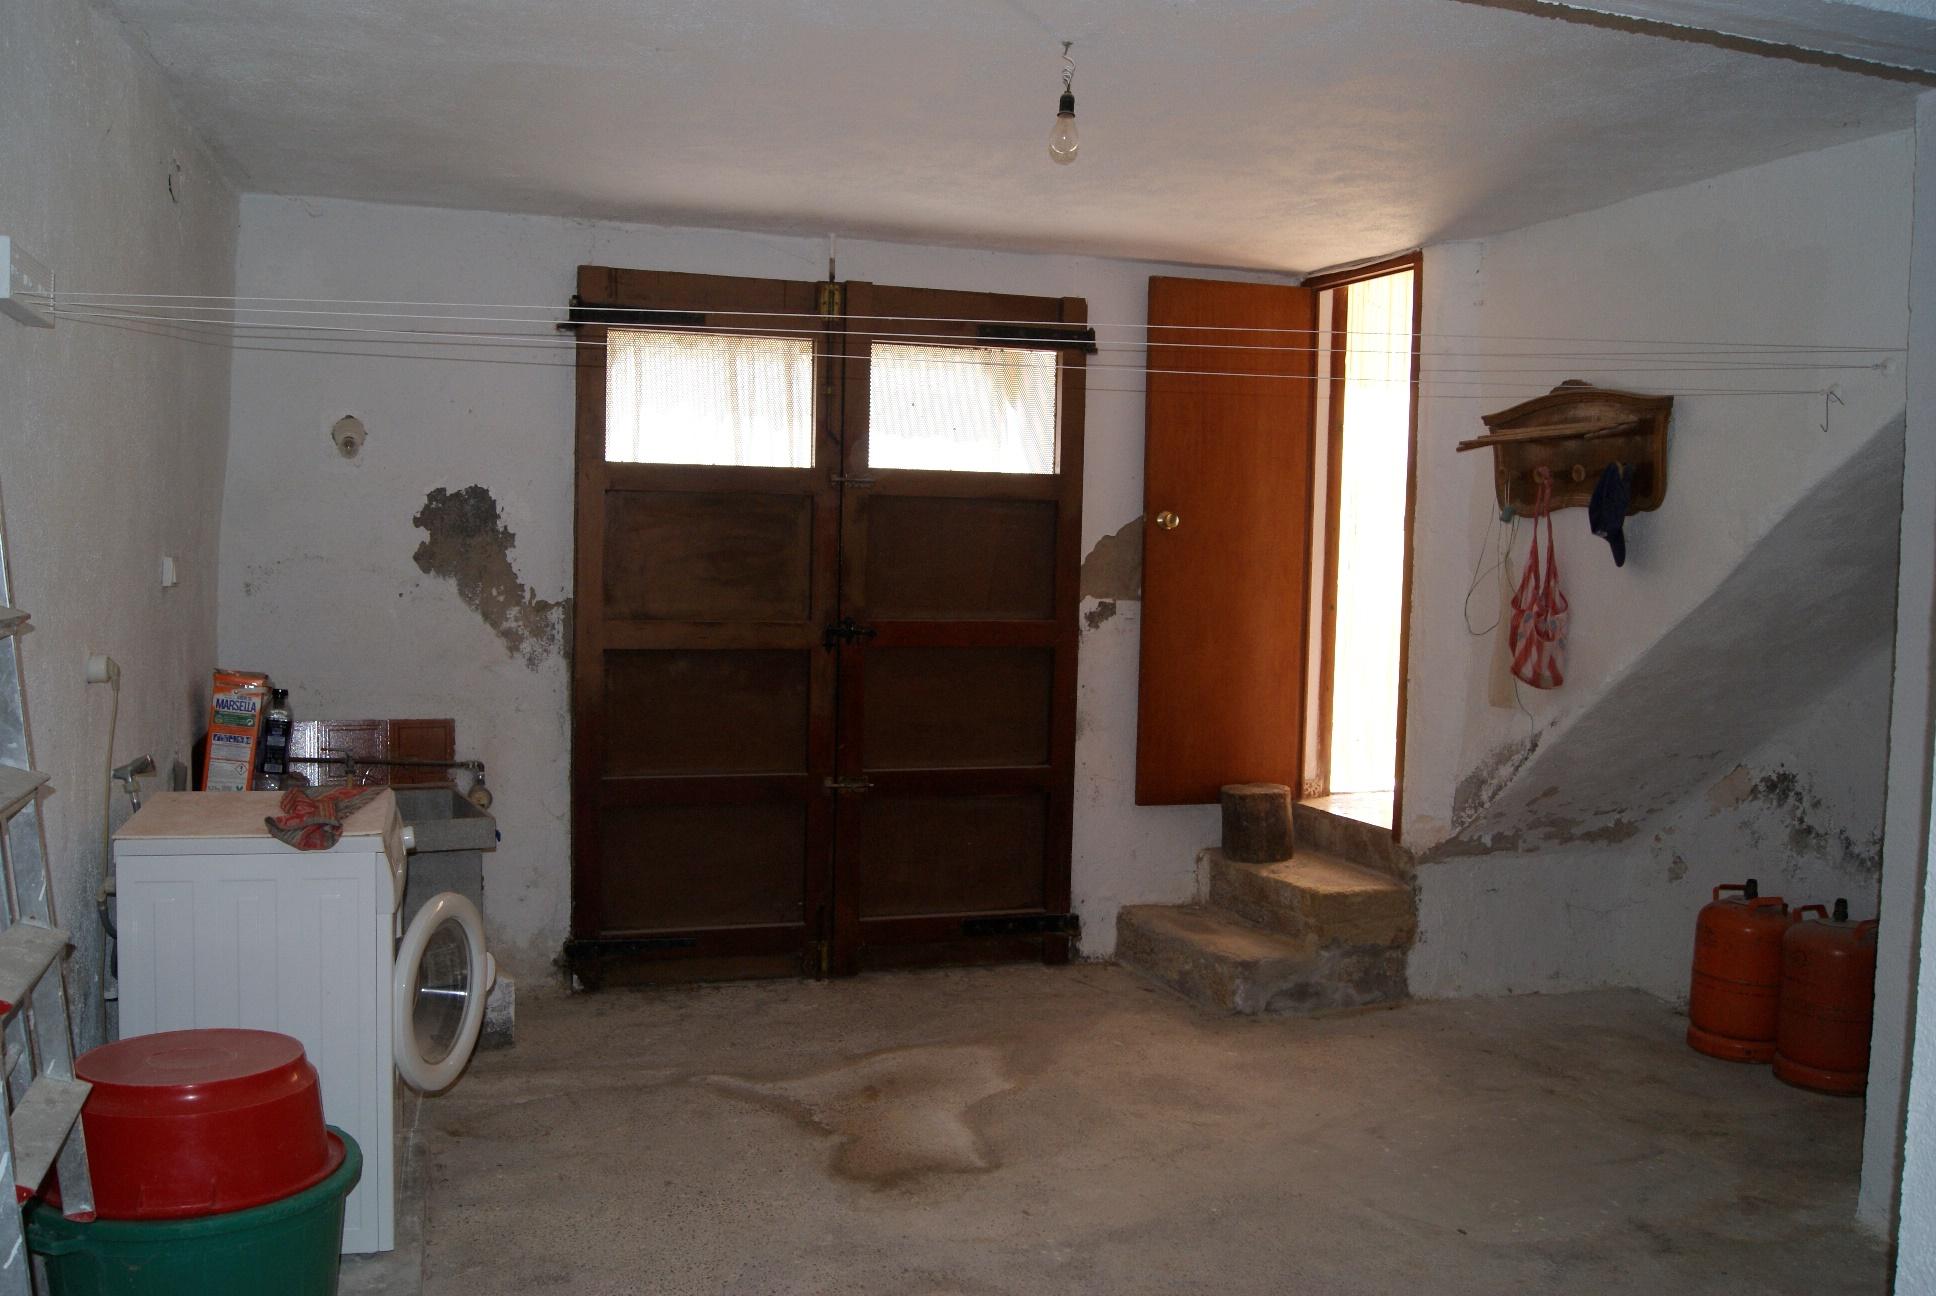 ARENYS DE LLEDO, 5 Bedrooms Bedrooms, 1 Room Rooms,2 BathroomsBathrooms,Casa de Poble,Urbana,ARENYS DE LLEDO,1184